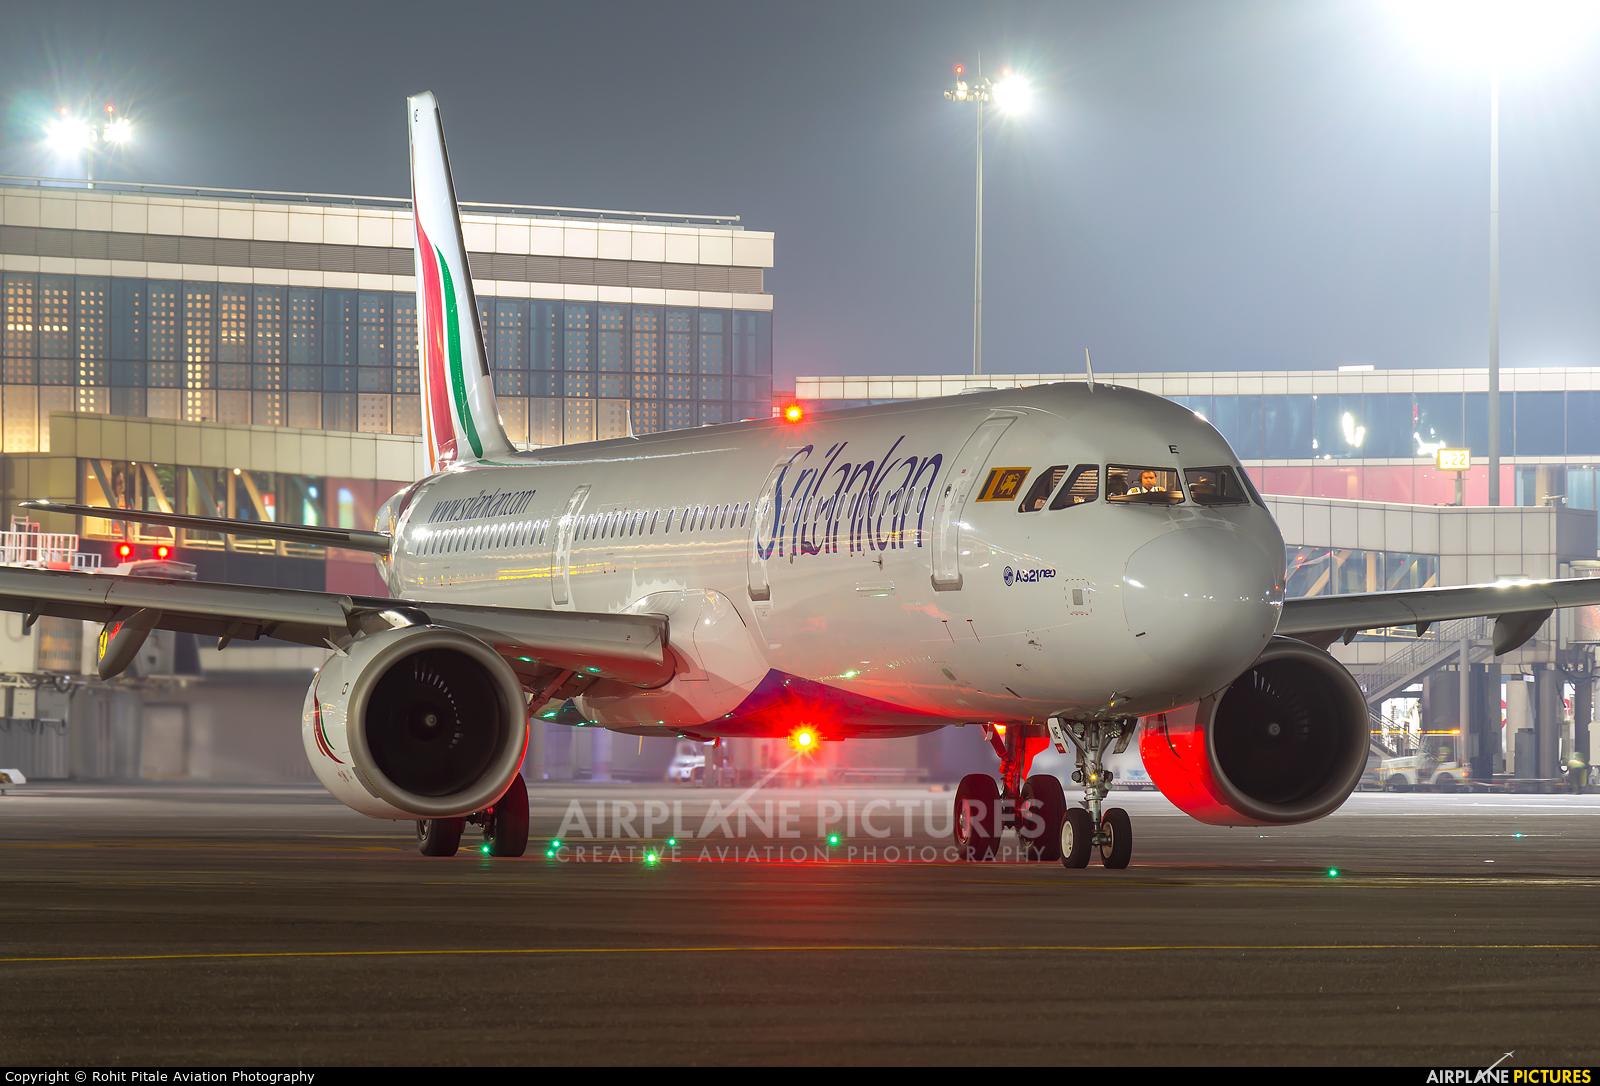 SriLankan Airlines 4R-ANE aircraft at Mumbai - Chhatrapati Shivaji Intl